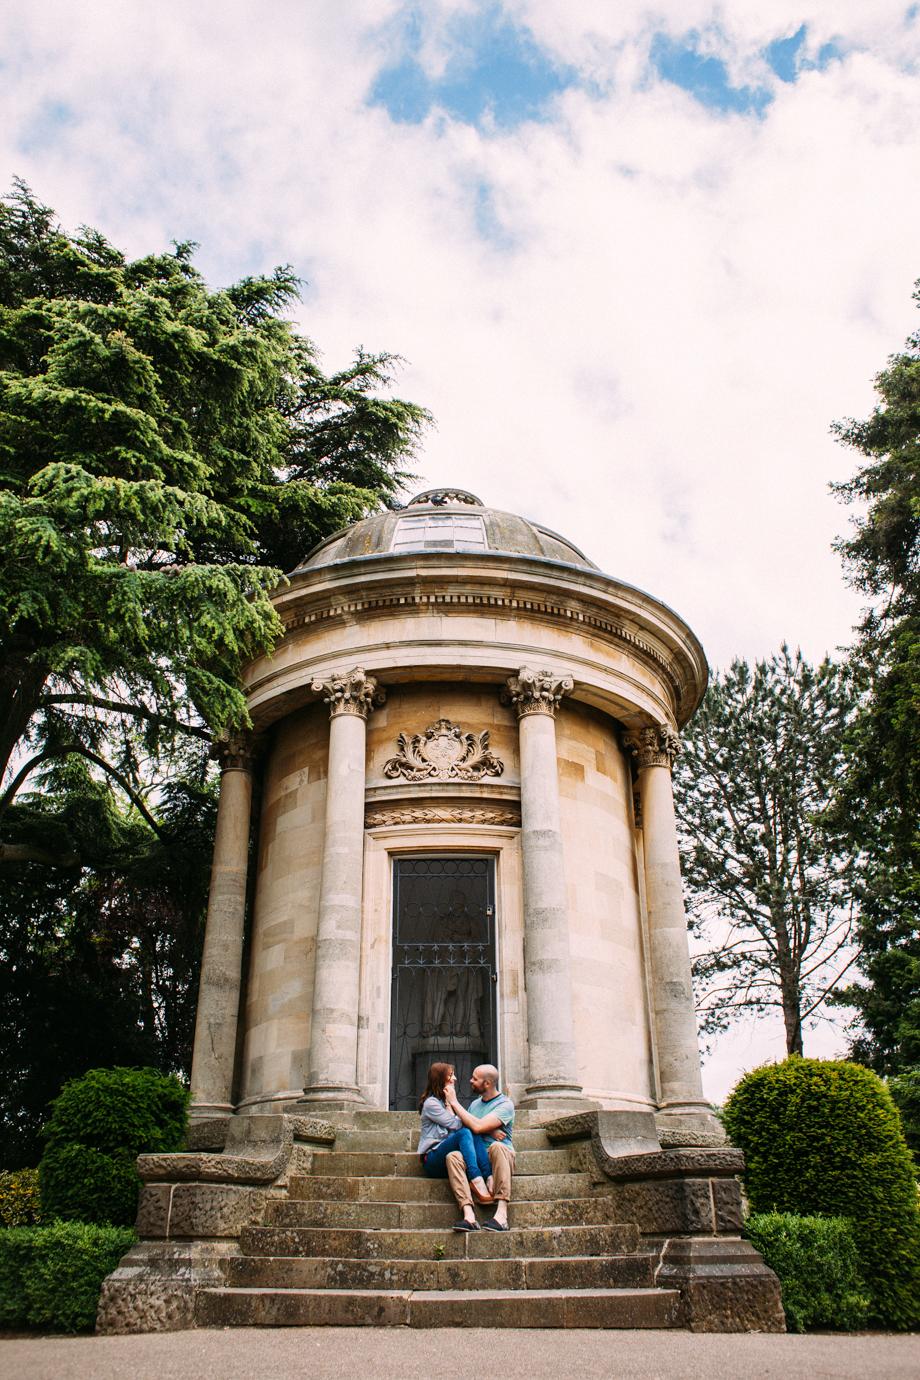 Jephson-Gardens-Pre-Wedding-Photography-7